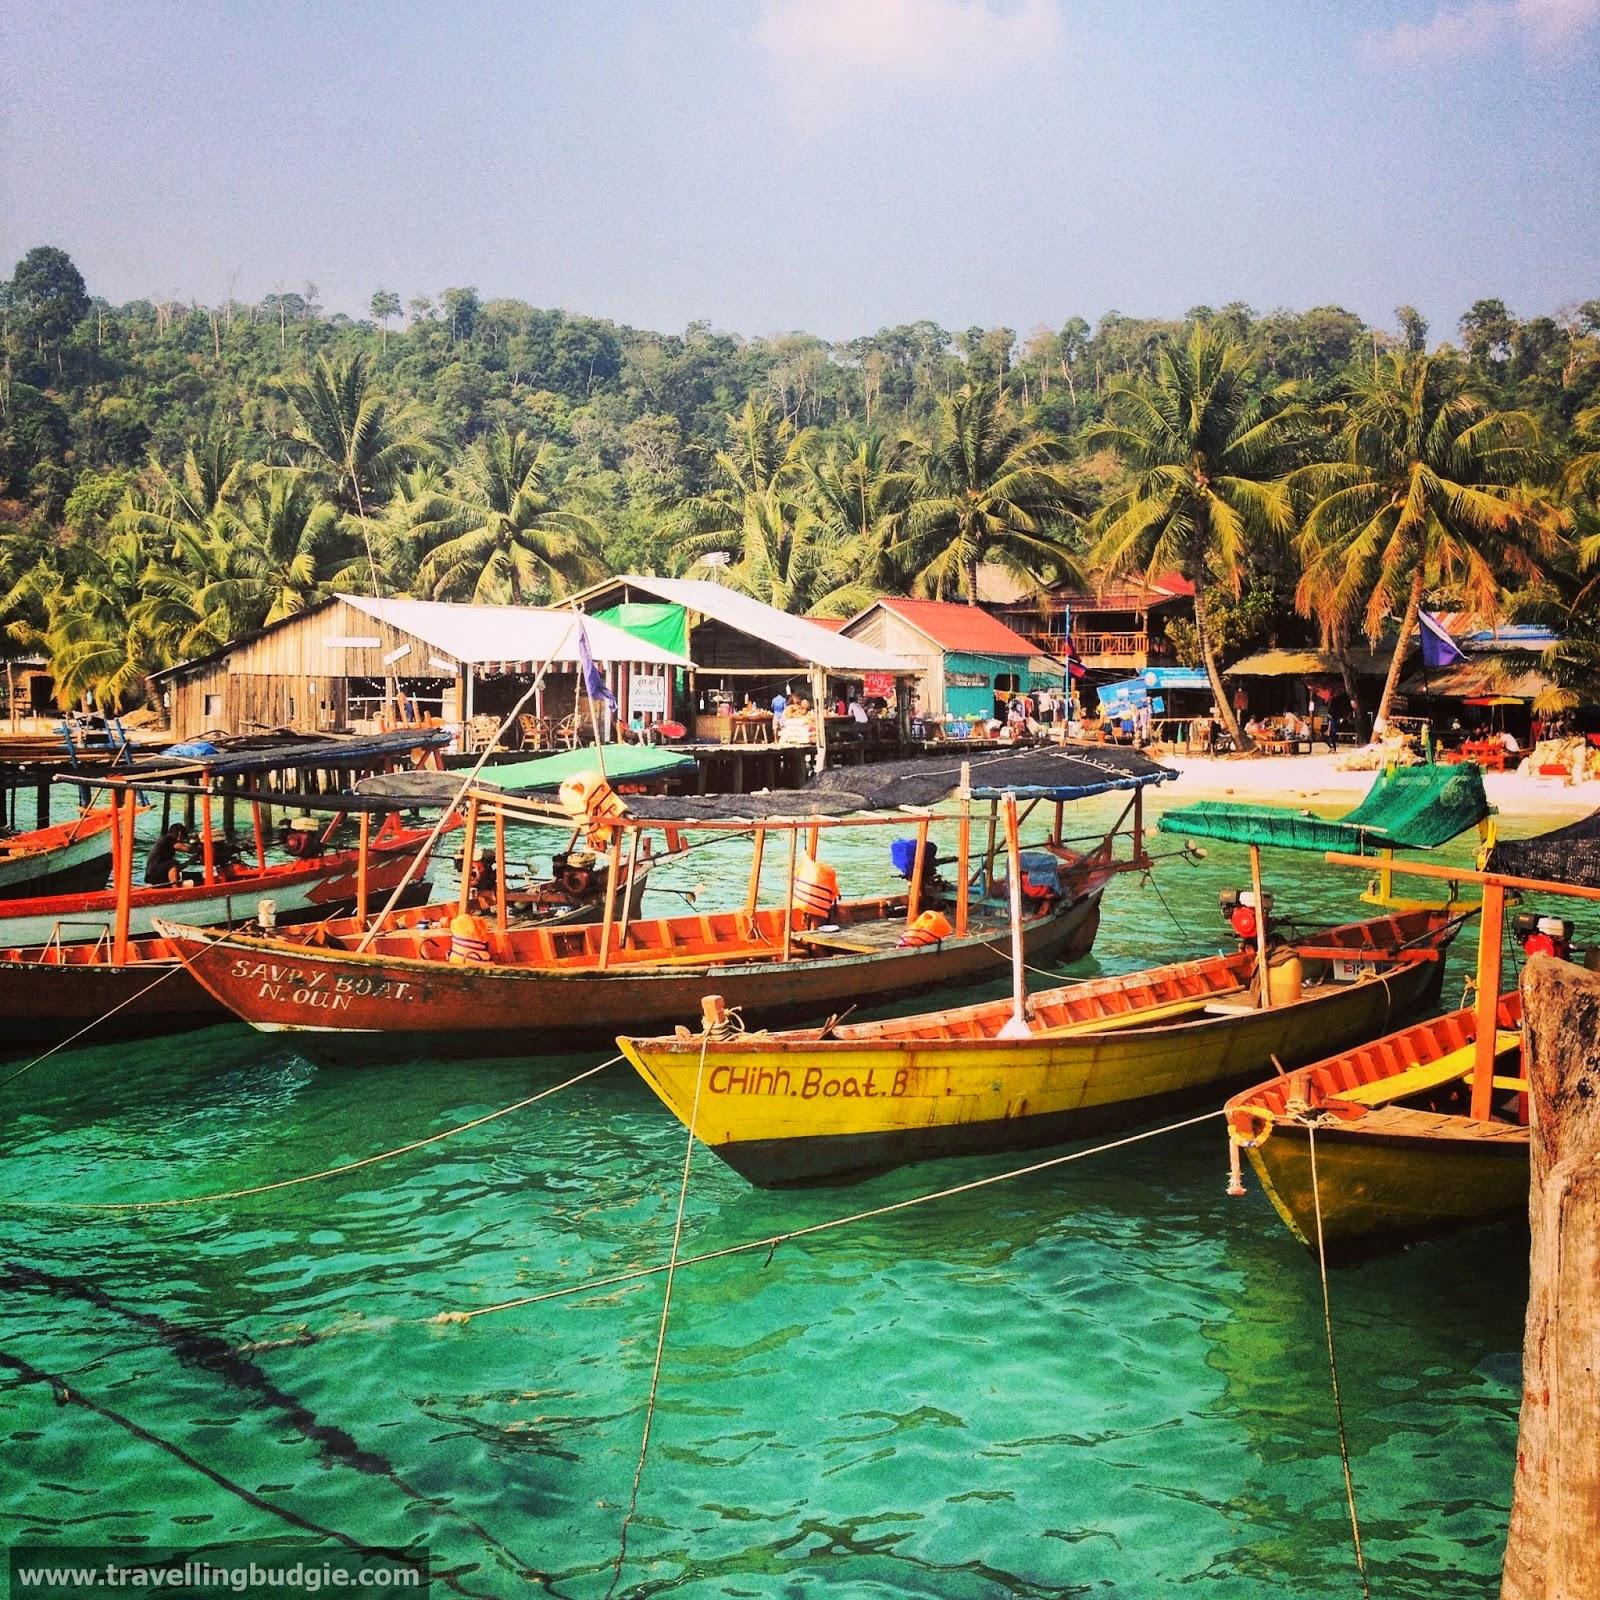 Cambodia: Travelling Budgie: Sihanoukville